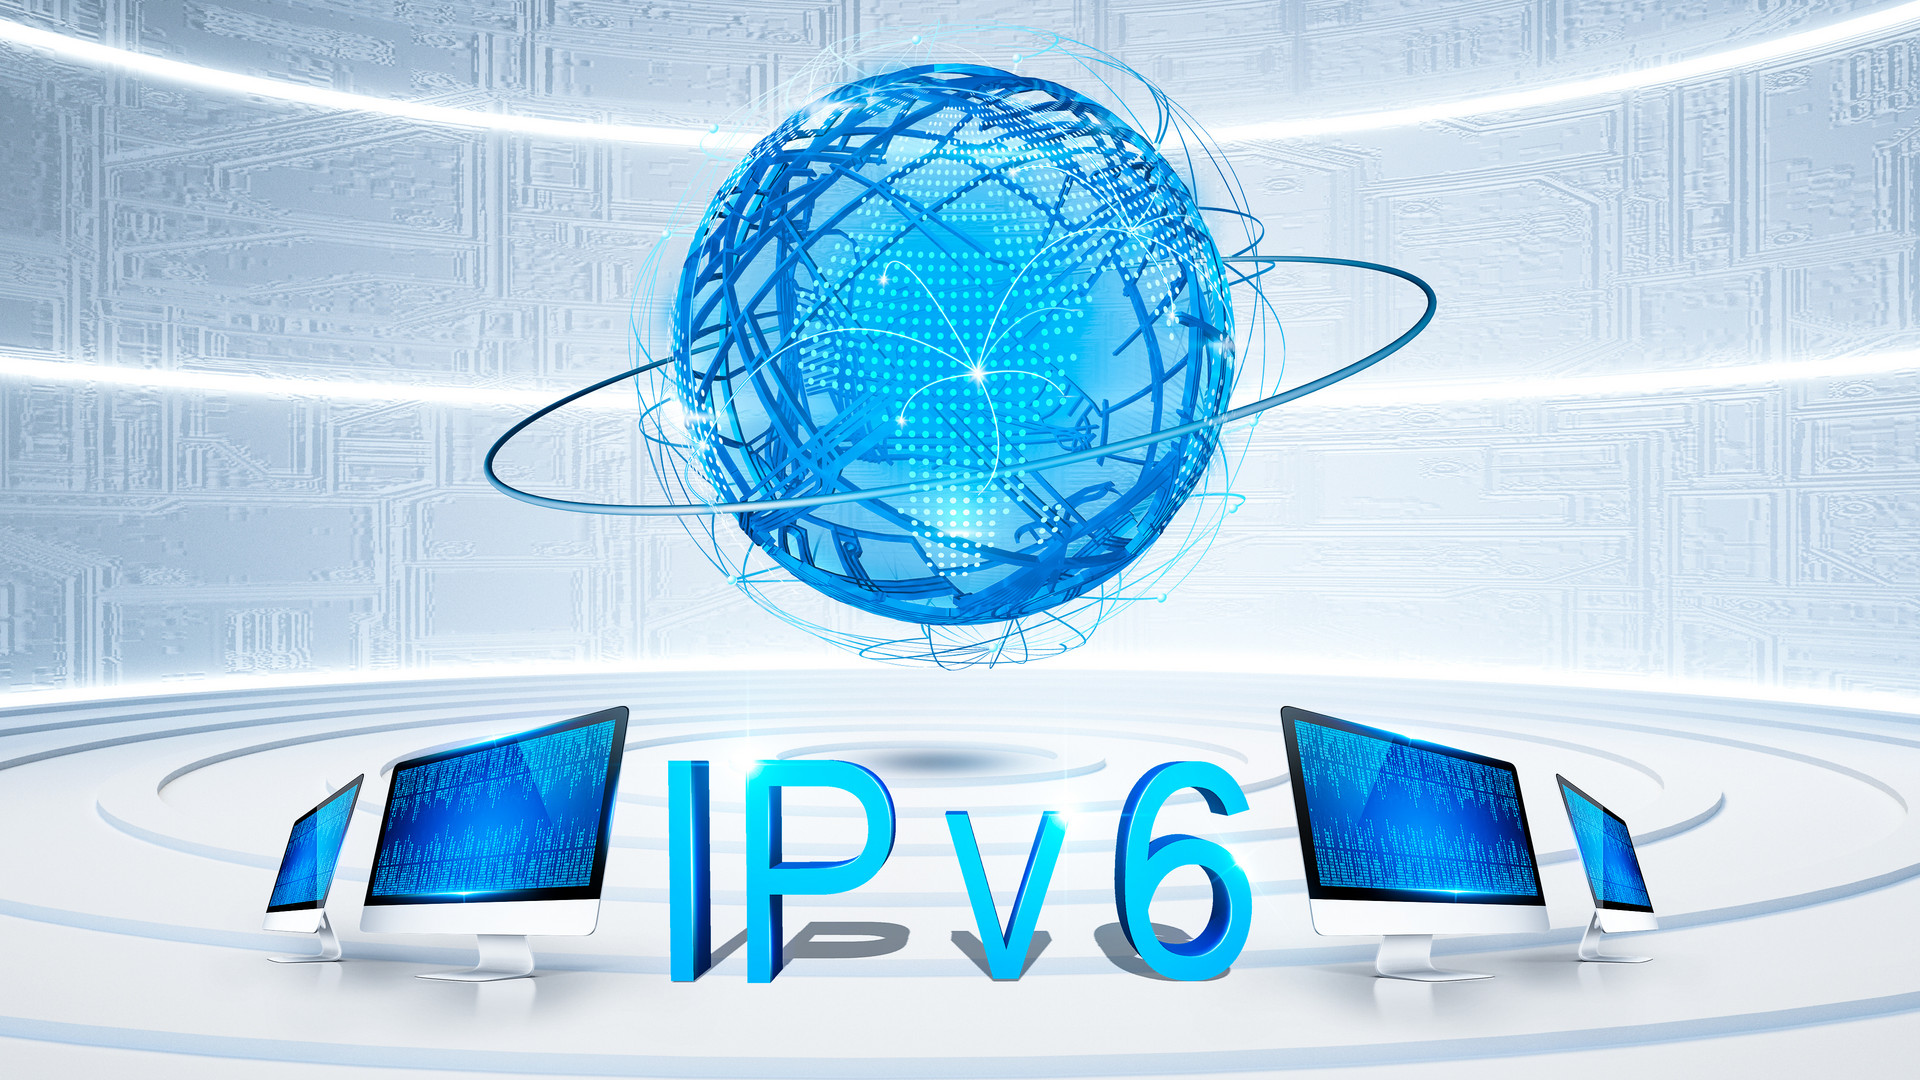 IPv6�W�j�模部署加速 年�然钴S�B接�颠_11.5 �|